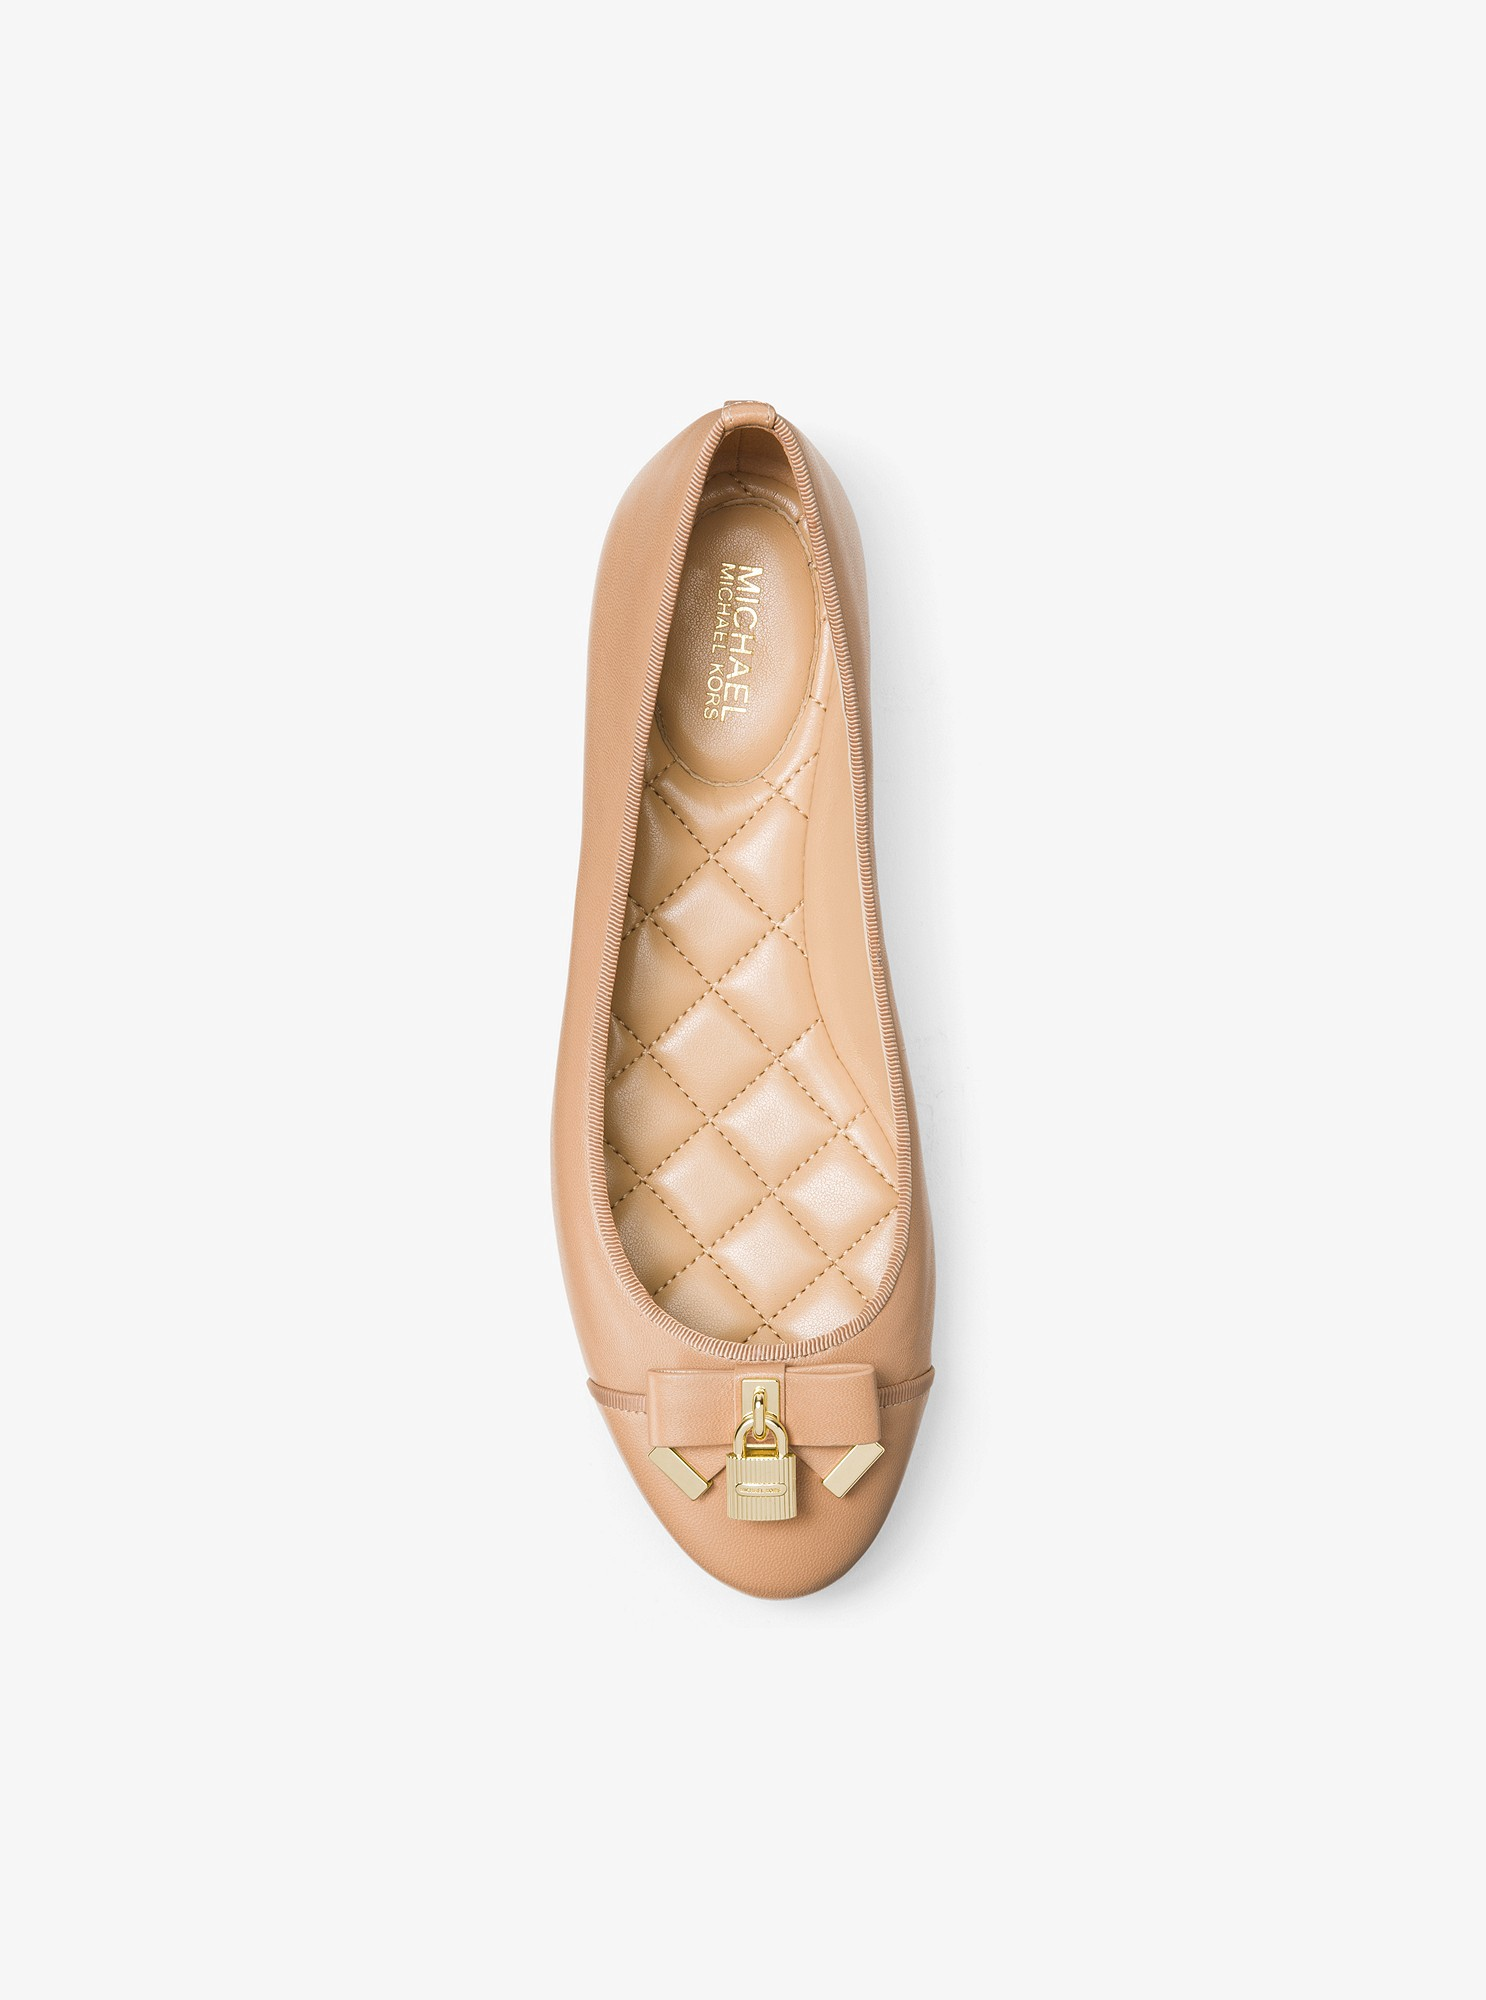 967f3872f8f Michael Kors Alice Leather Ballet Flat - Toffee 9.5